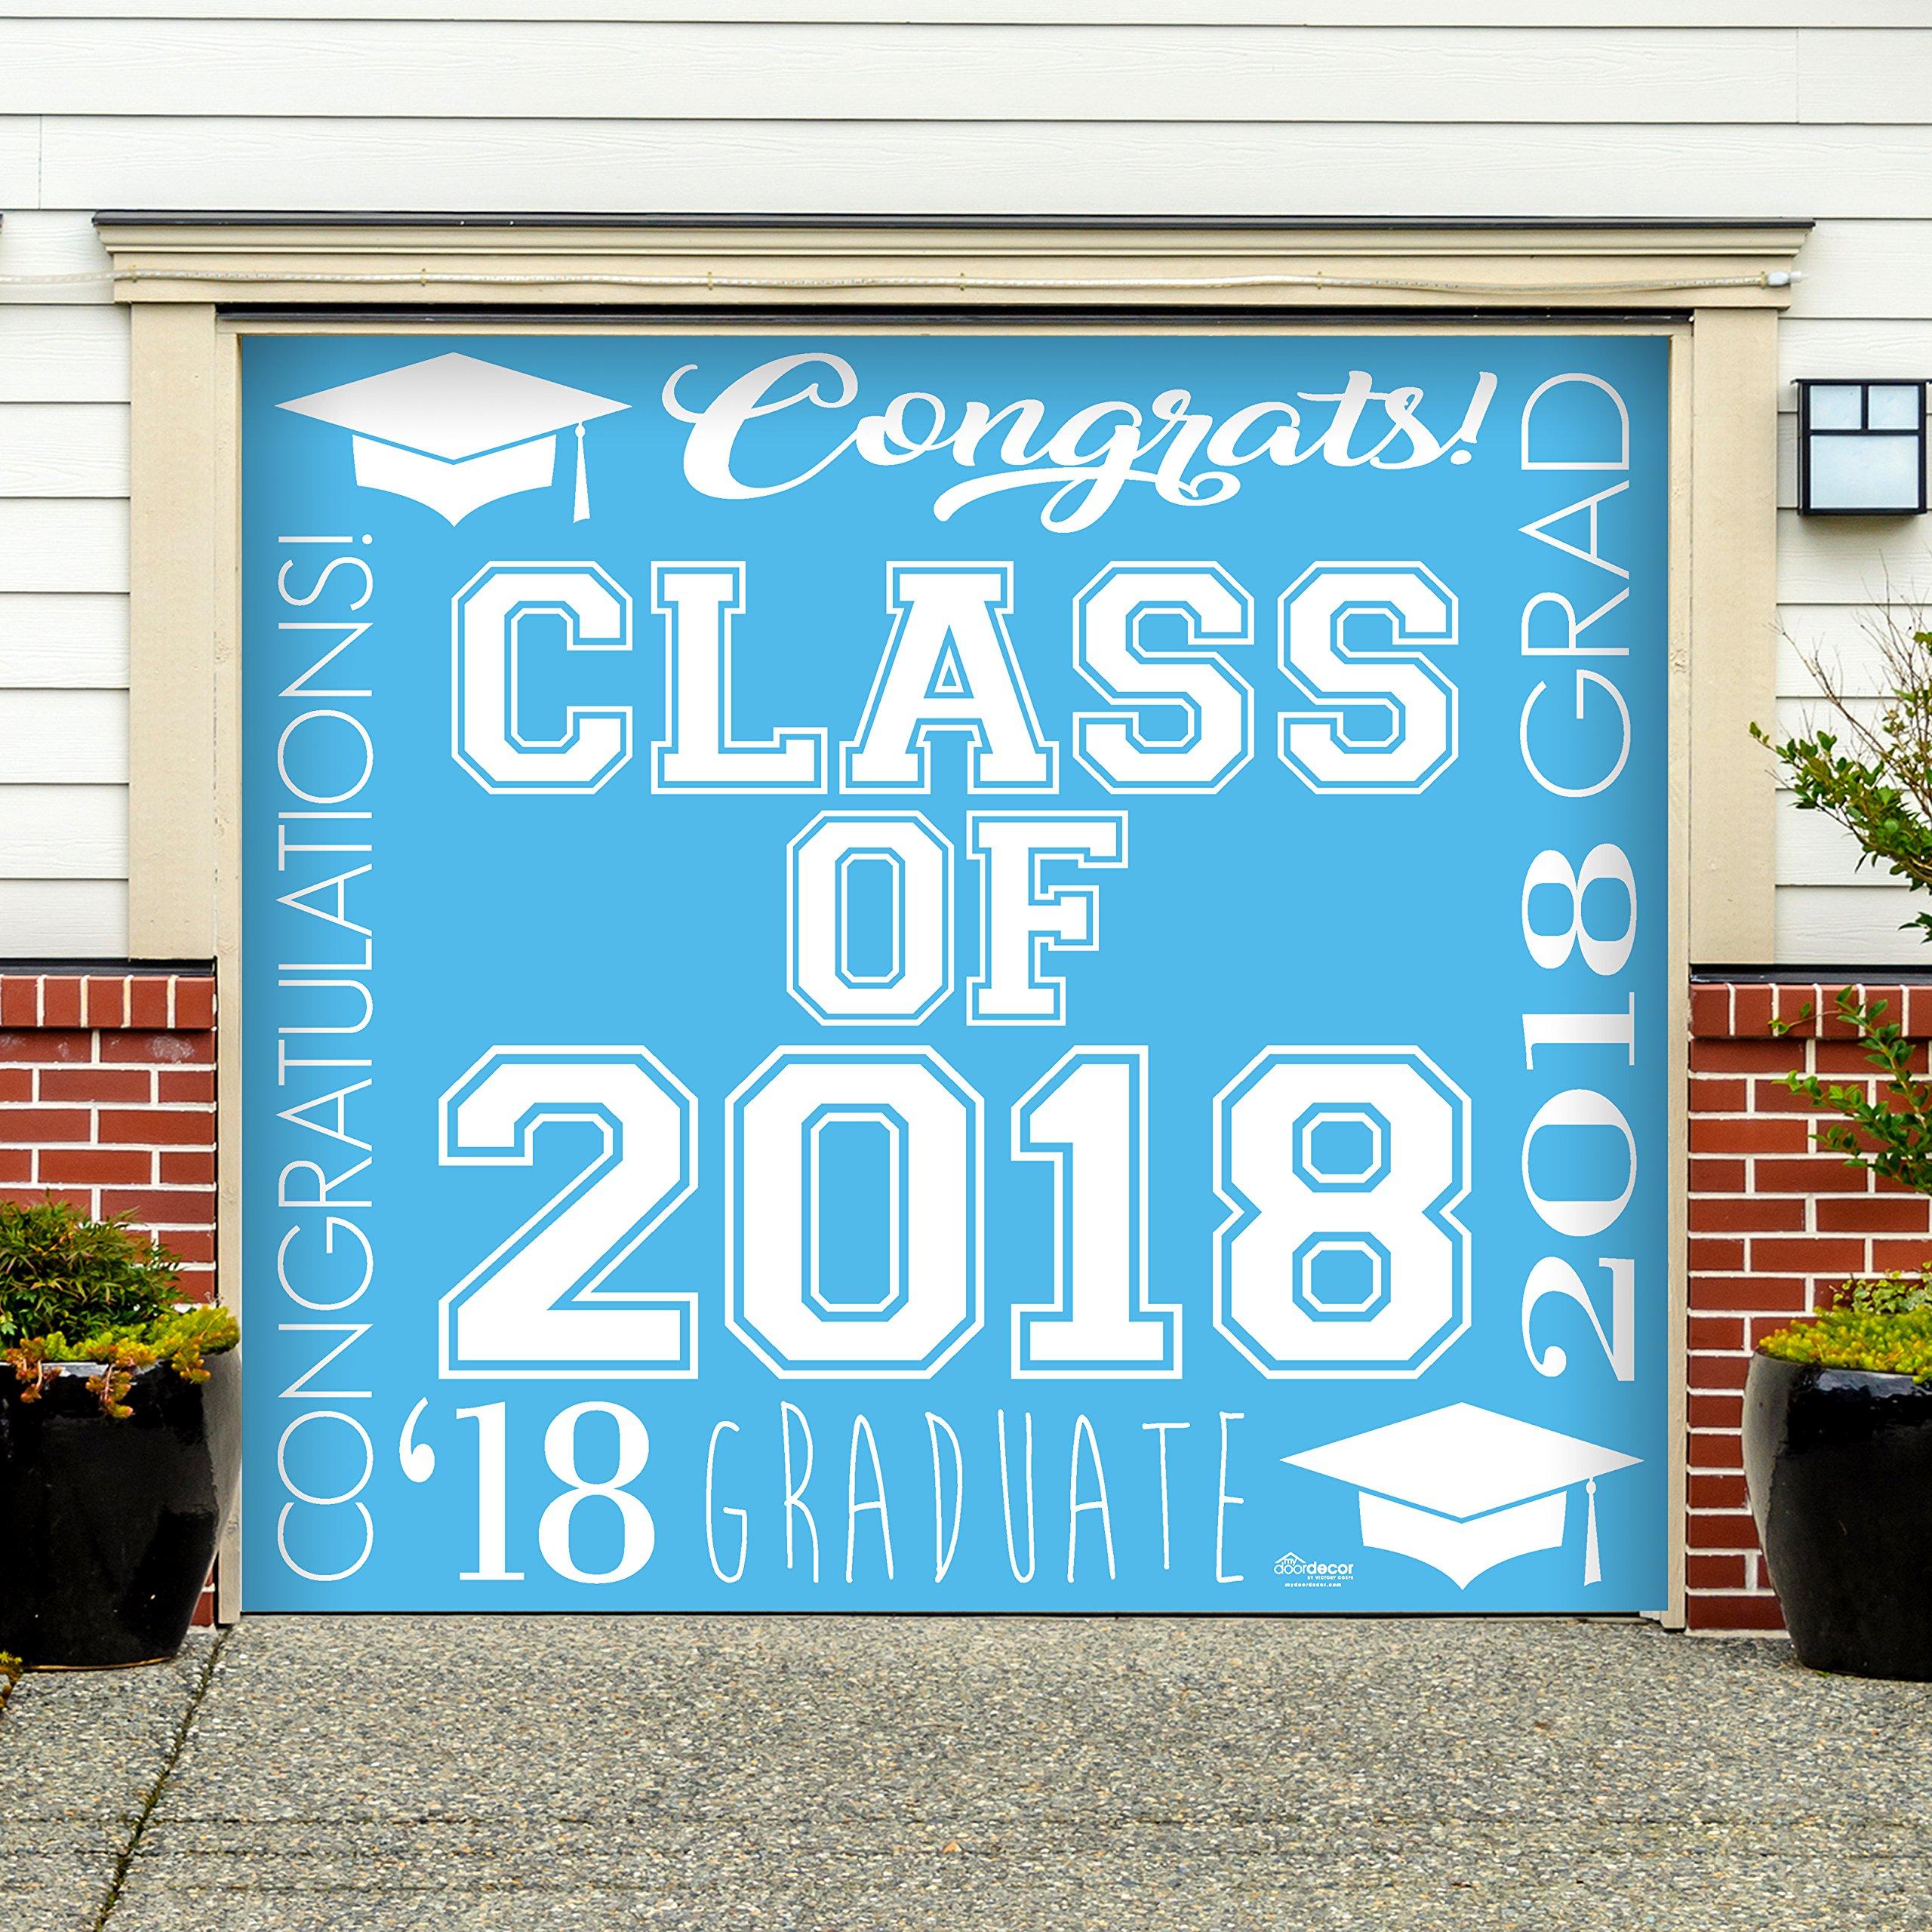 Victory Corps Collage Light Blue - Outdoor Graduation Garage Door Banner Mural Sign Décor 7'x 8' Car Garage - The Original Holiday Garage Door Banner Decor